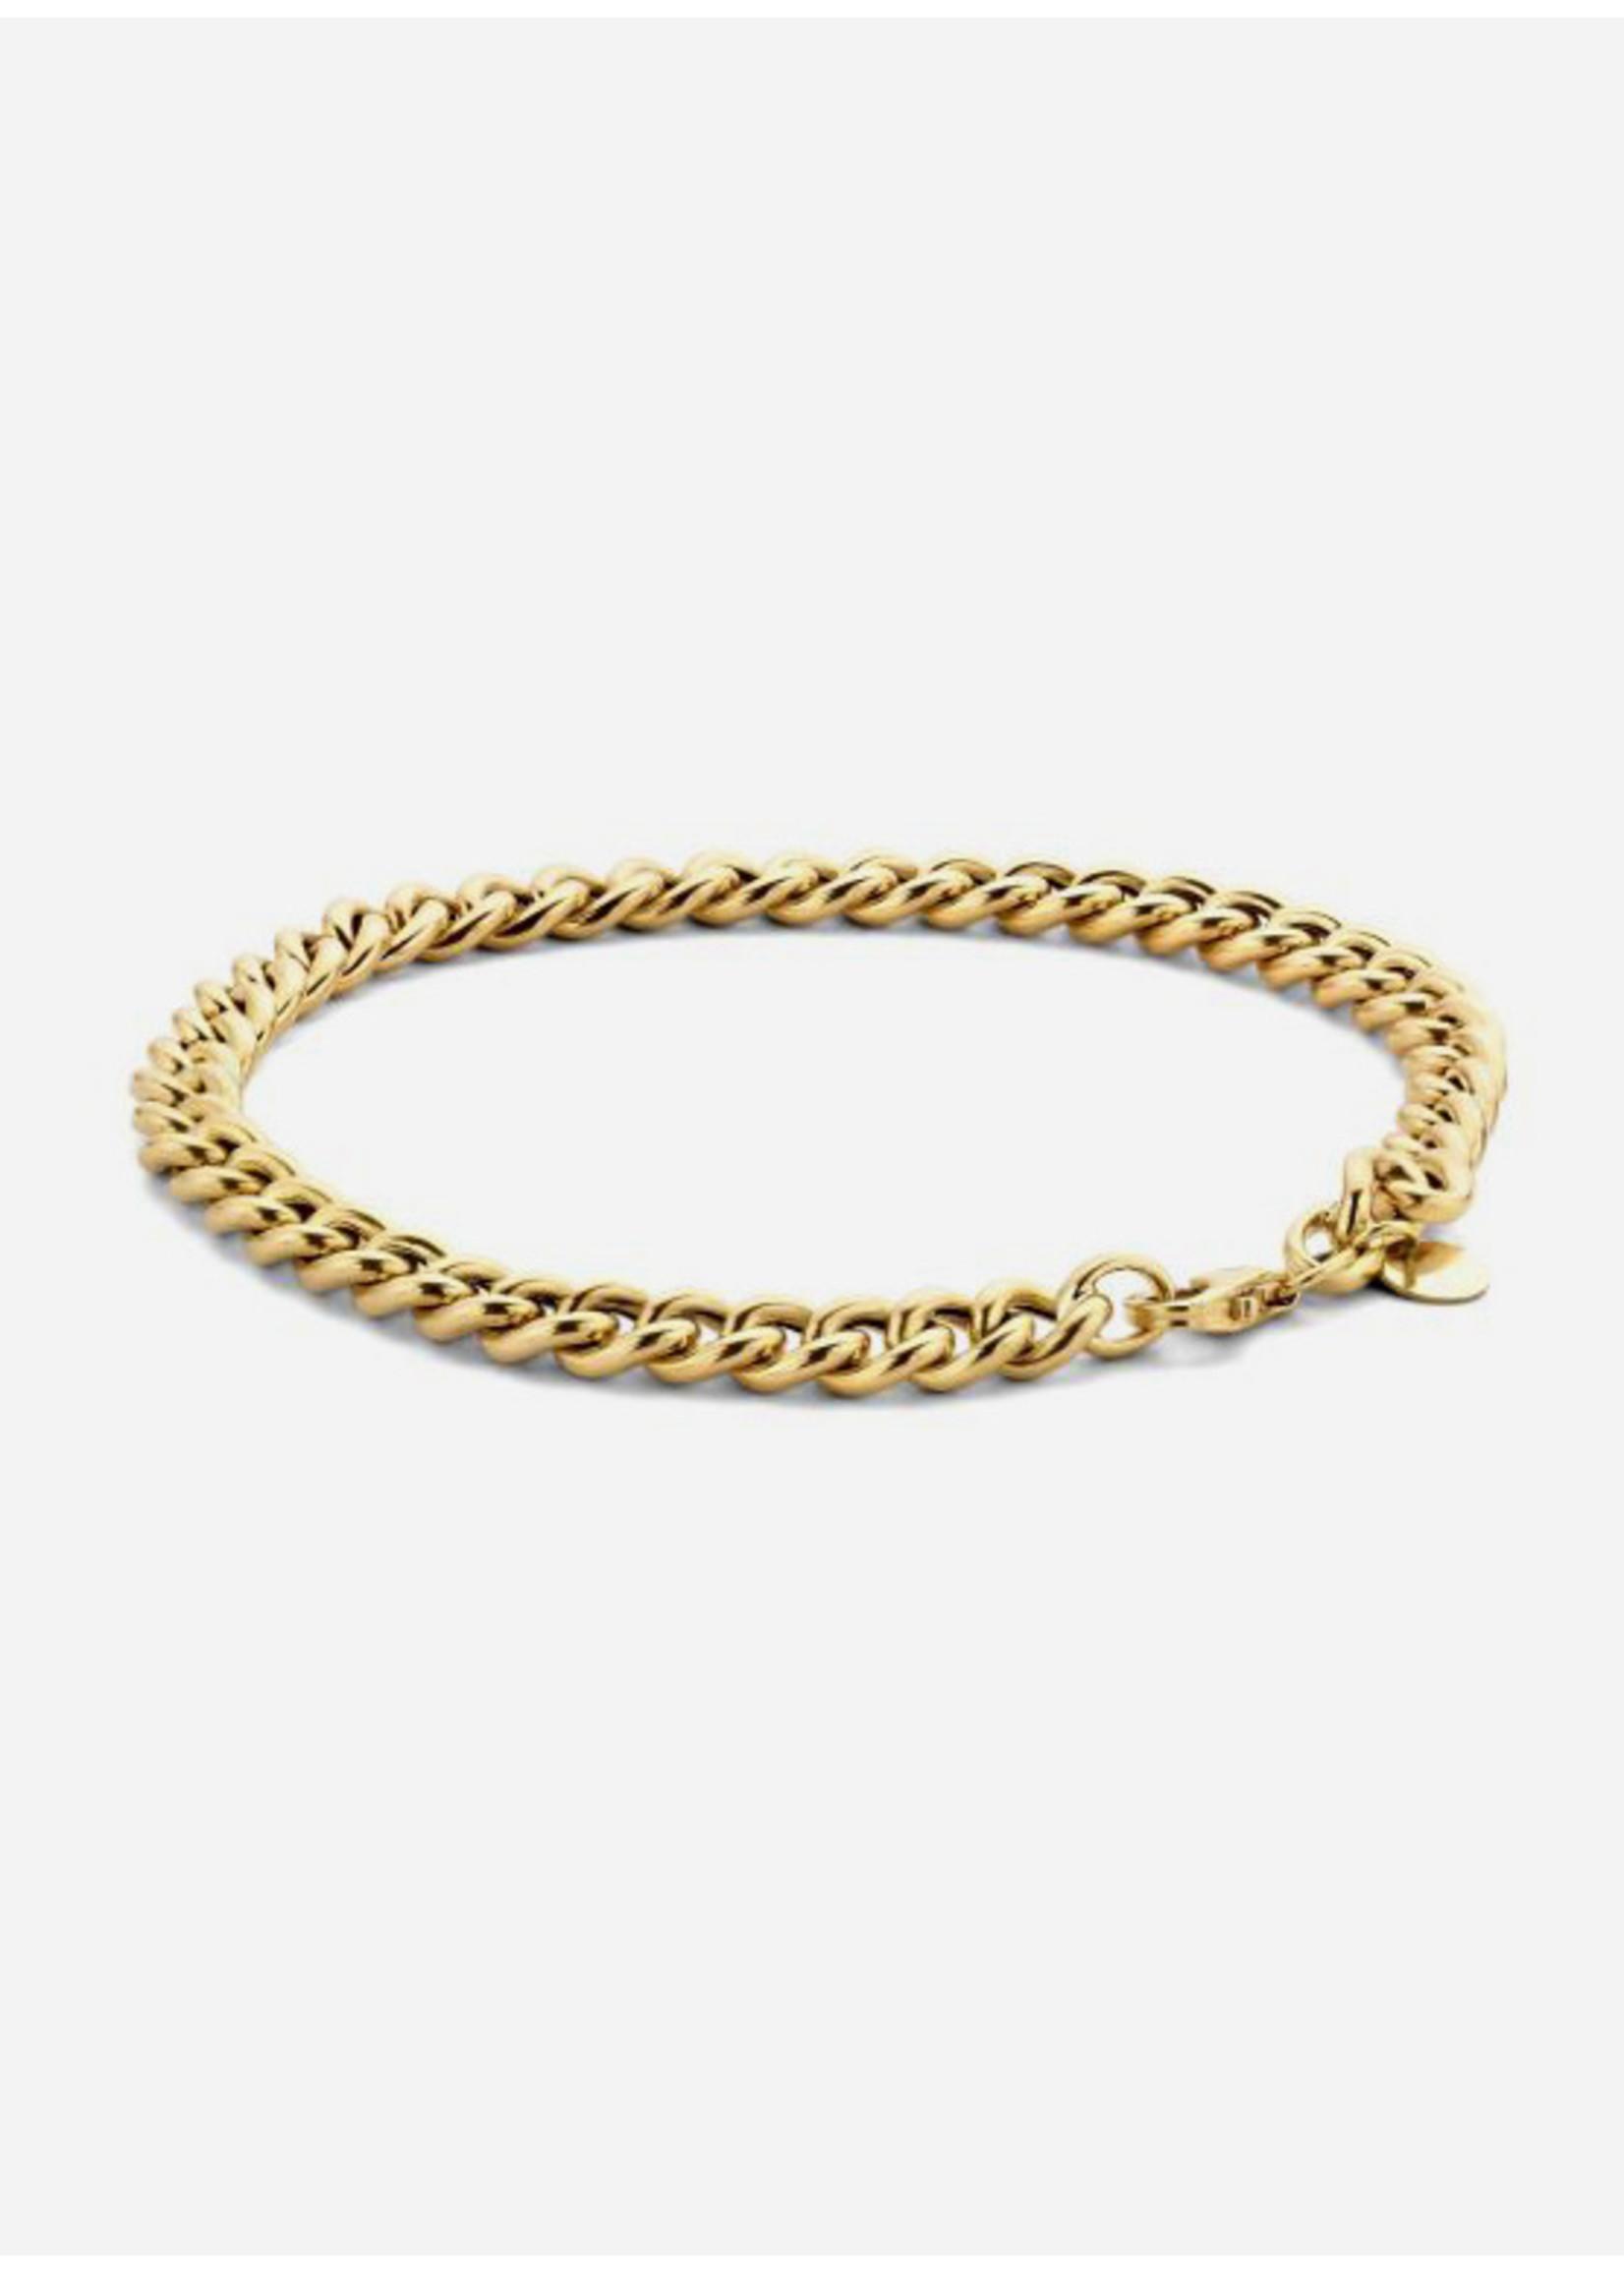 Just Franky Charm bracelet 18 cm